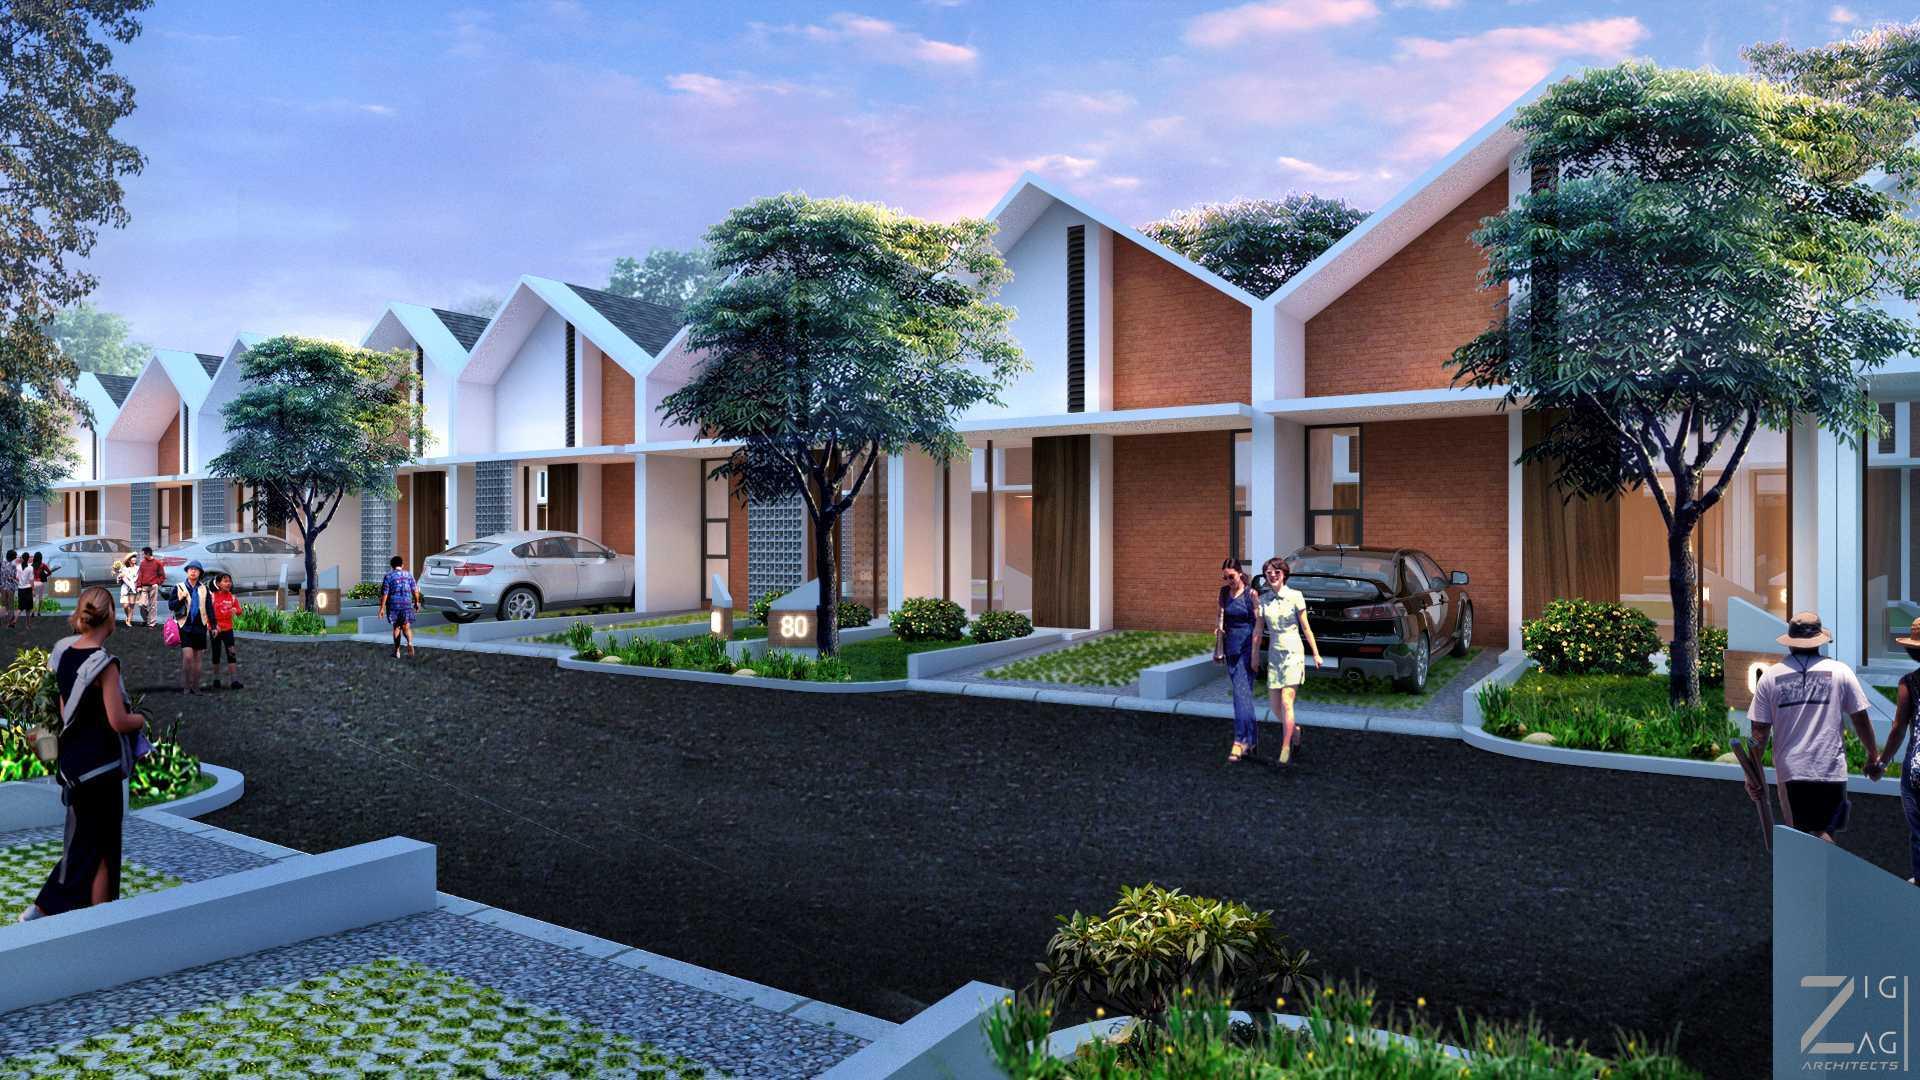 Zigzag Architecture Studio Cipamokolan Residence Bandung, Kota Bandung, Jawa Barat, Indonesia Bandung, Kota Bandung, Jawa Barat, Indonesia Viewrumah   37077